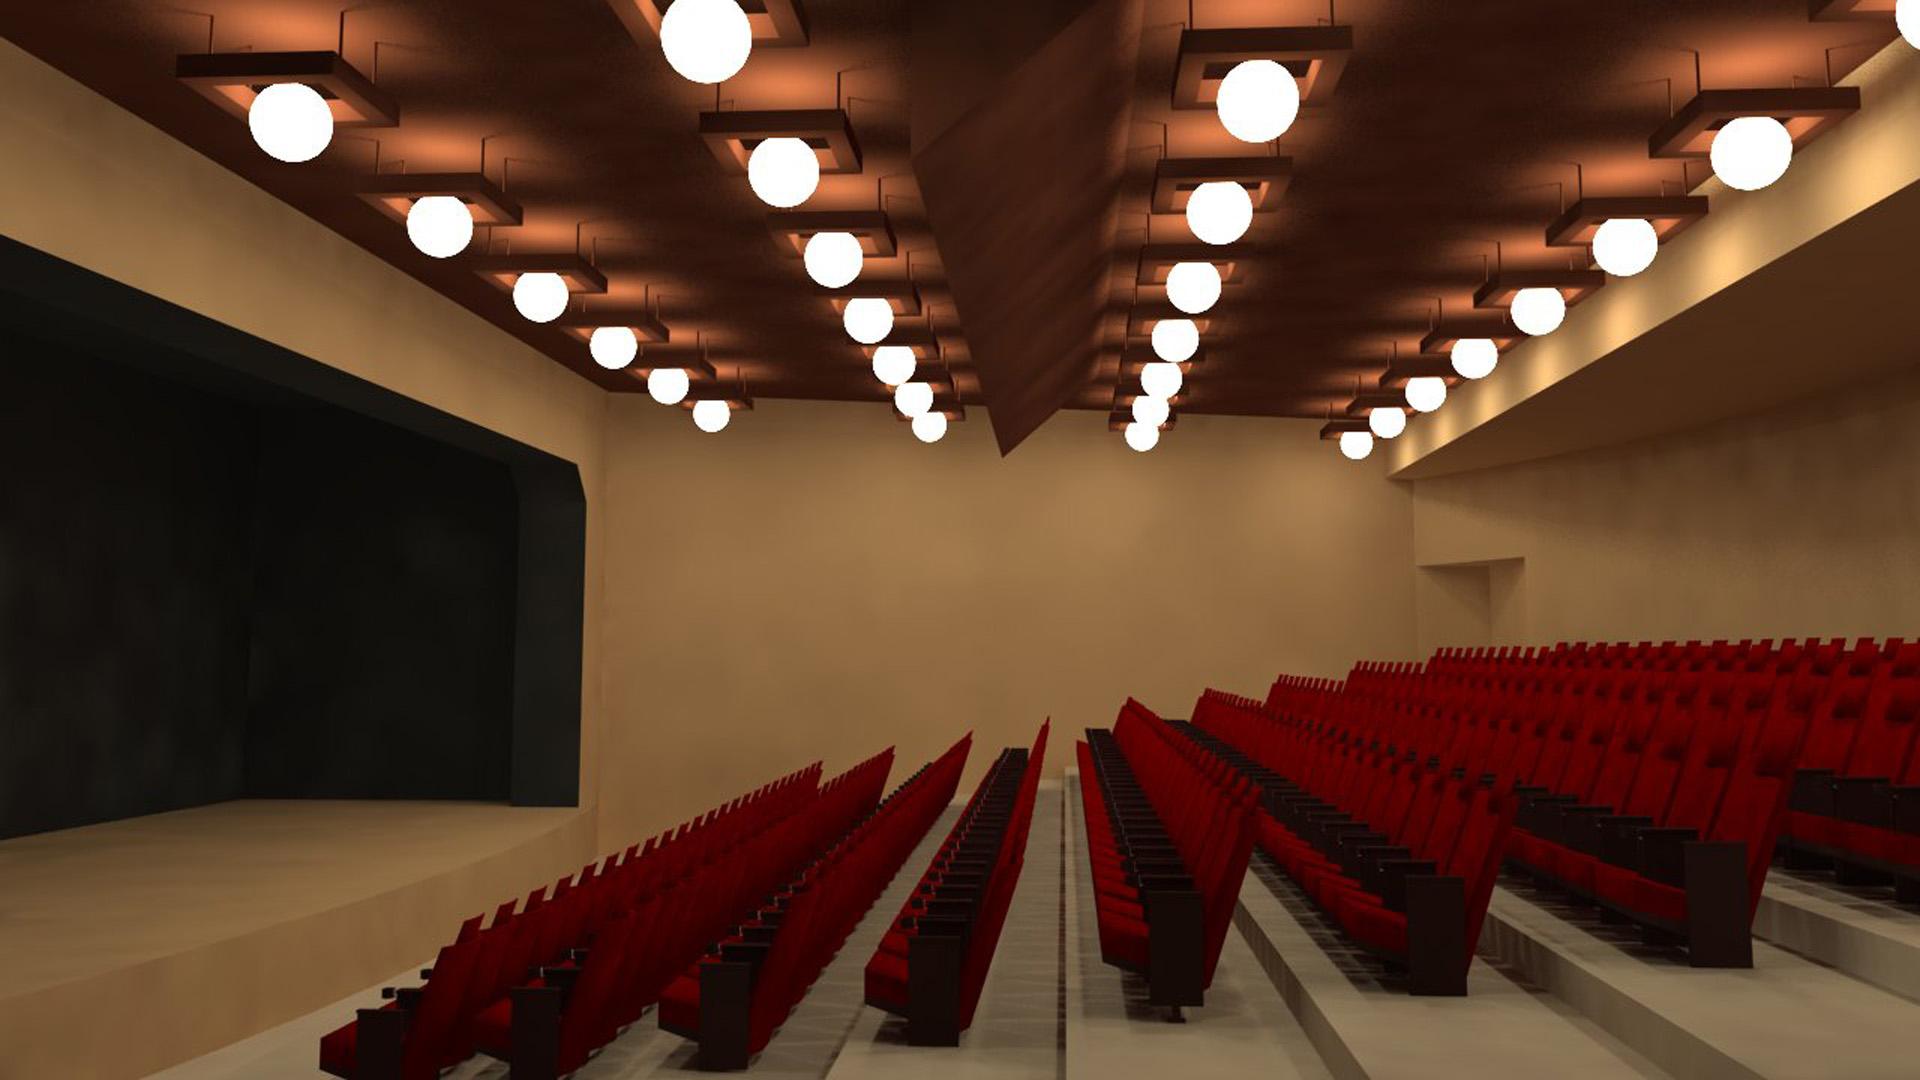 vizualizácia LED kino